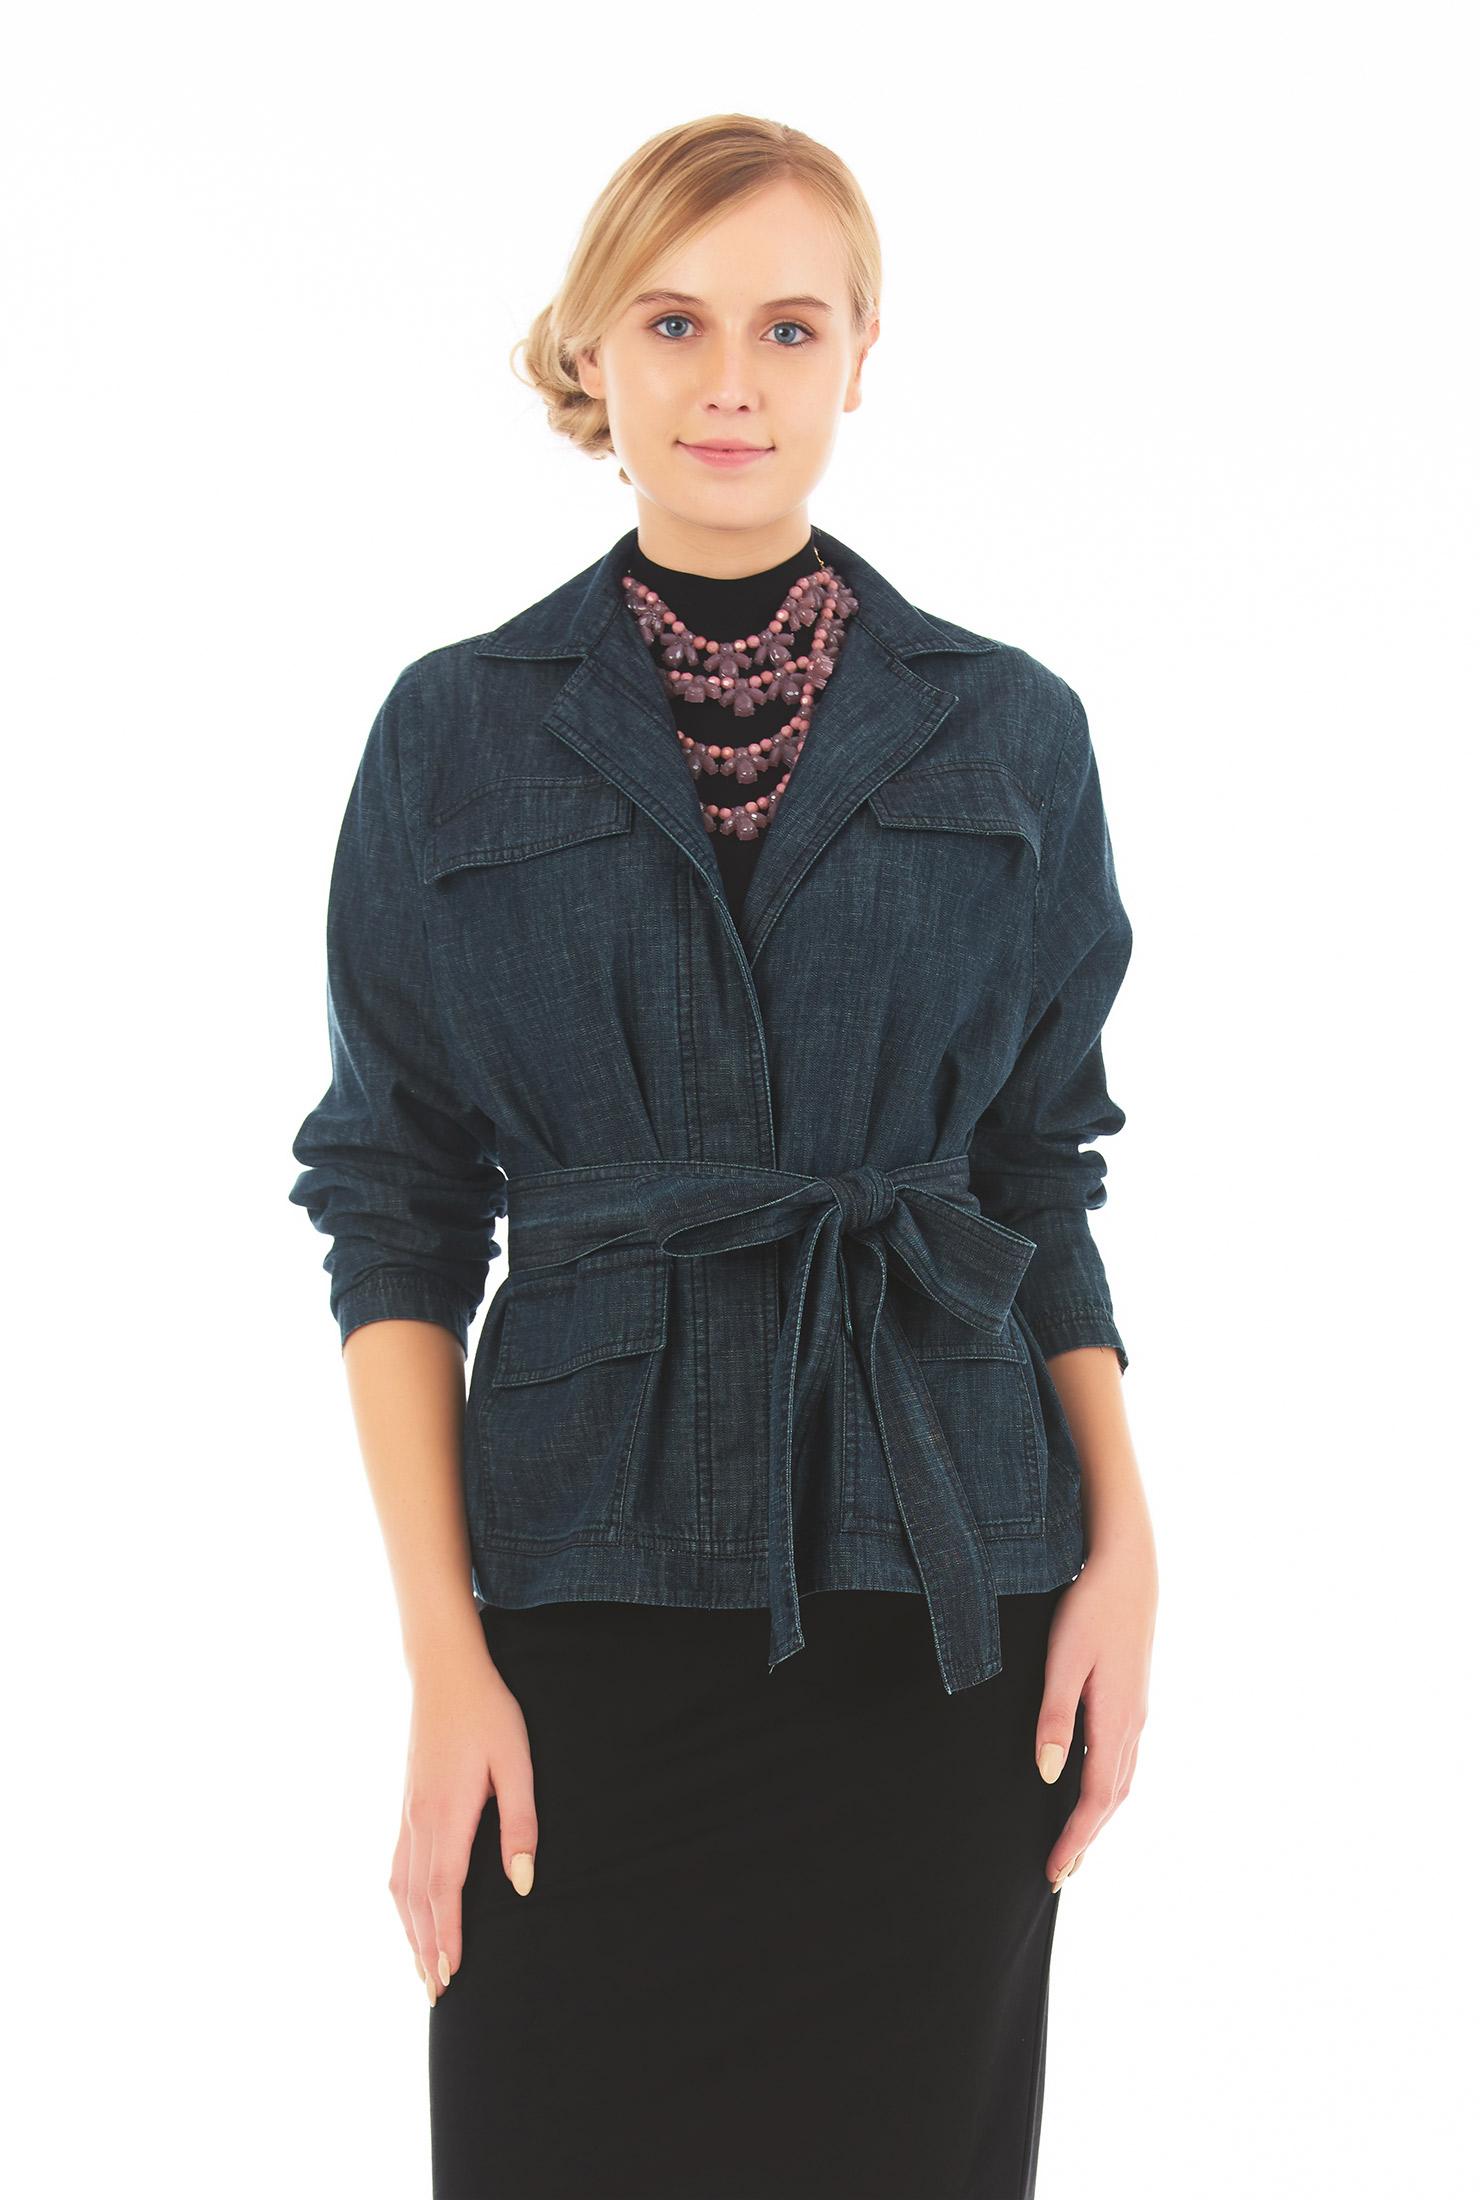 Eshakti Womens Sash Tie Belt Cotton Denim Jacket